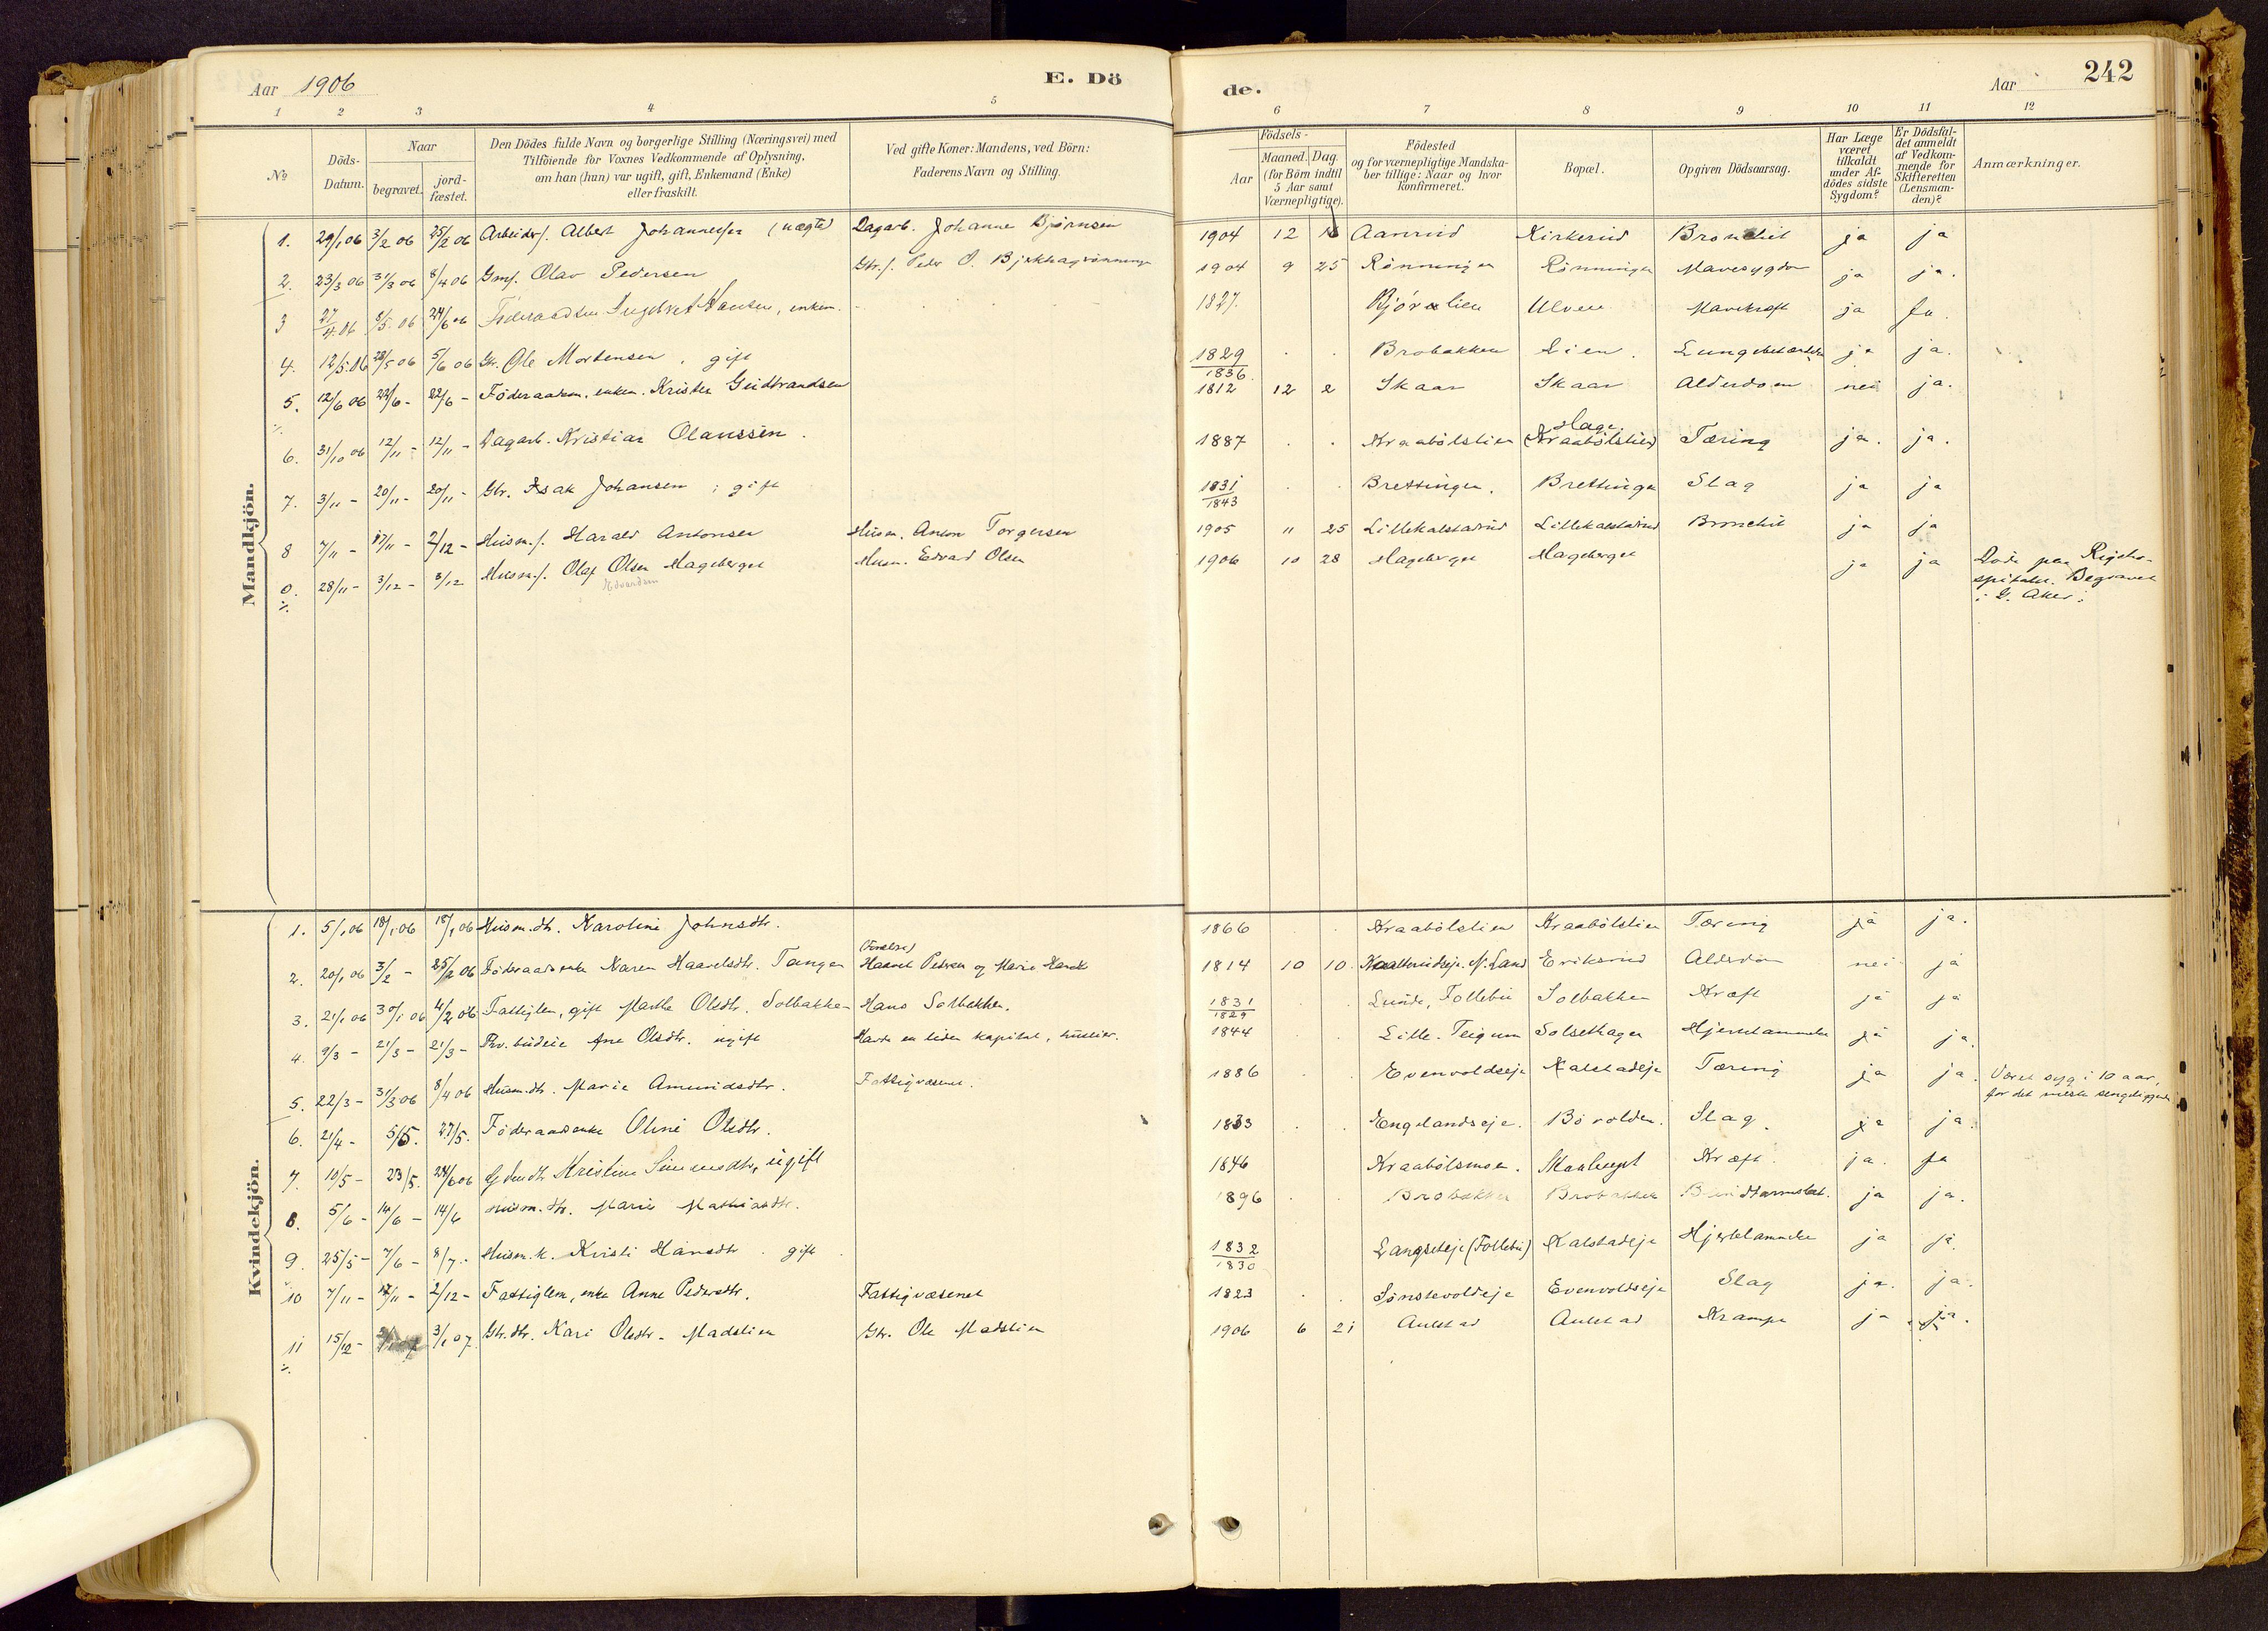 SAH, Vestre Gausdal prestekontor, Ministerialbok nr. 1, 1887-1914, s. 242